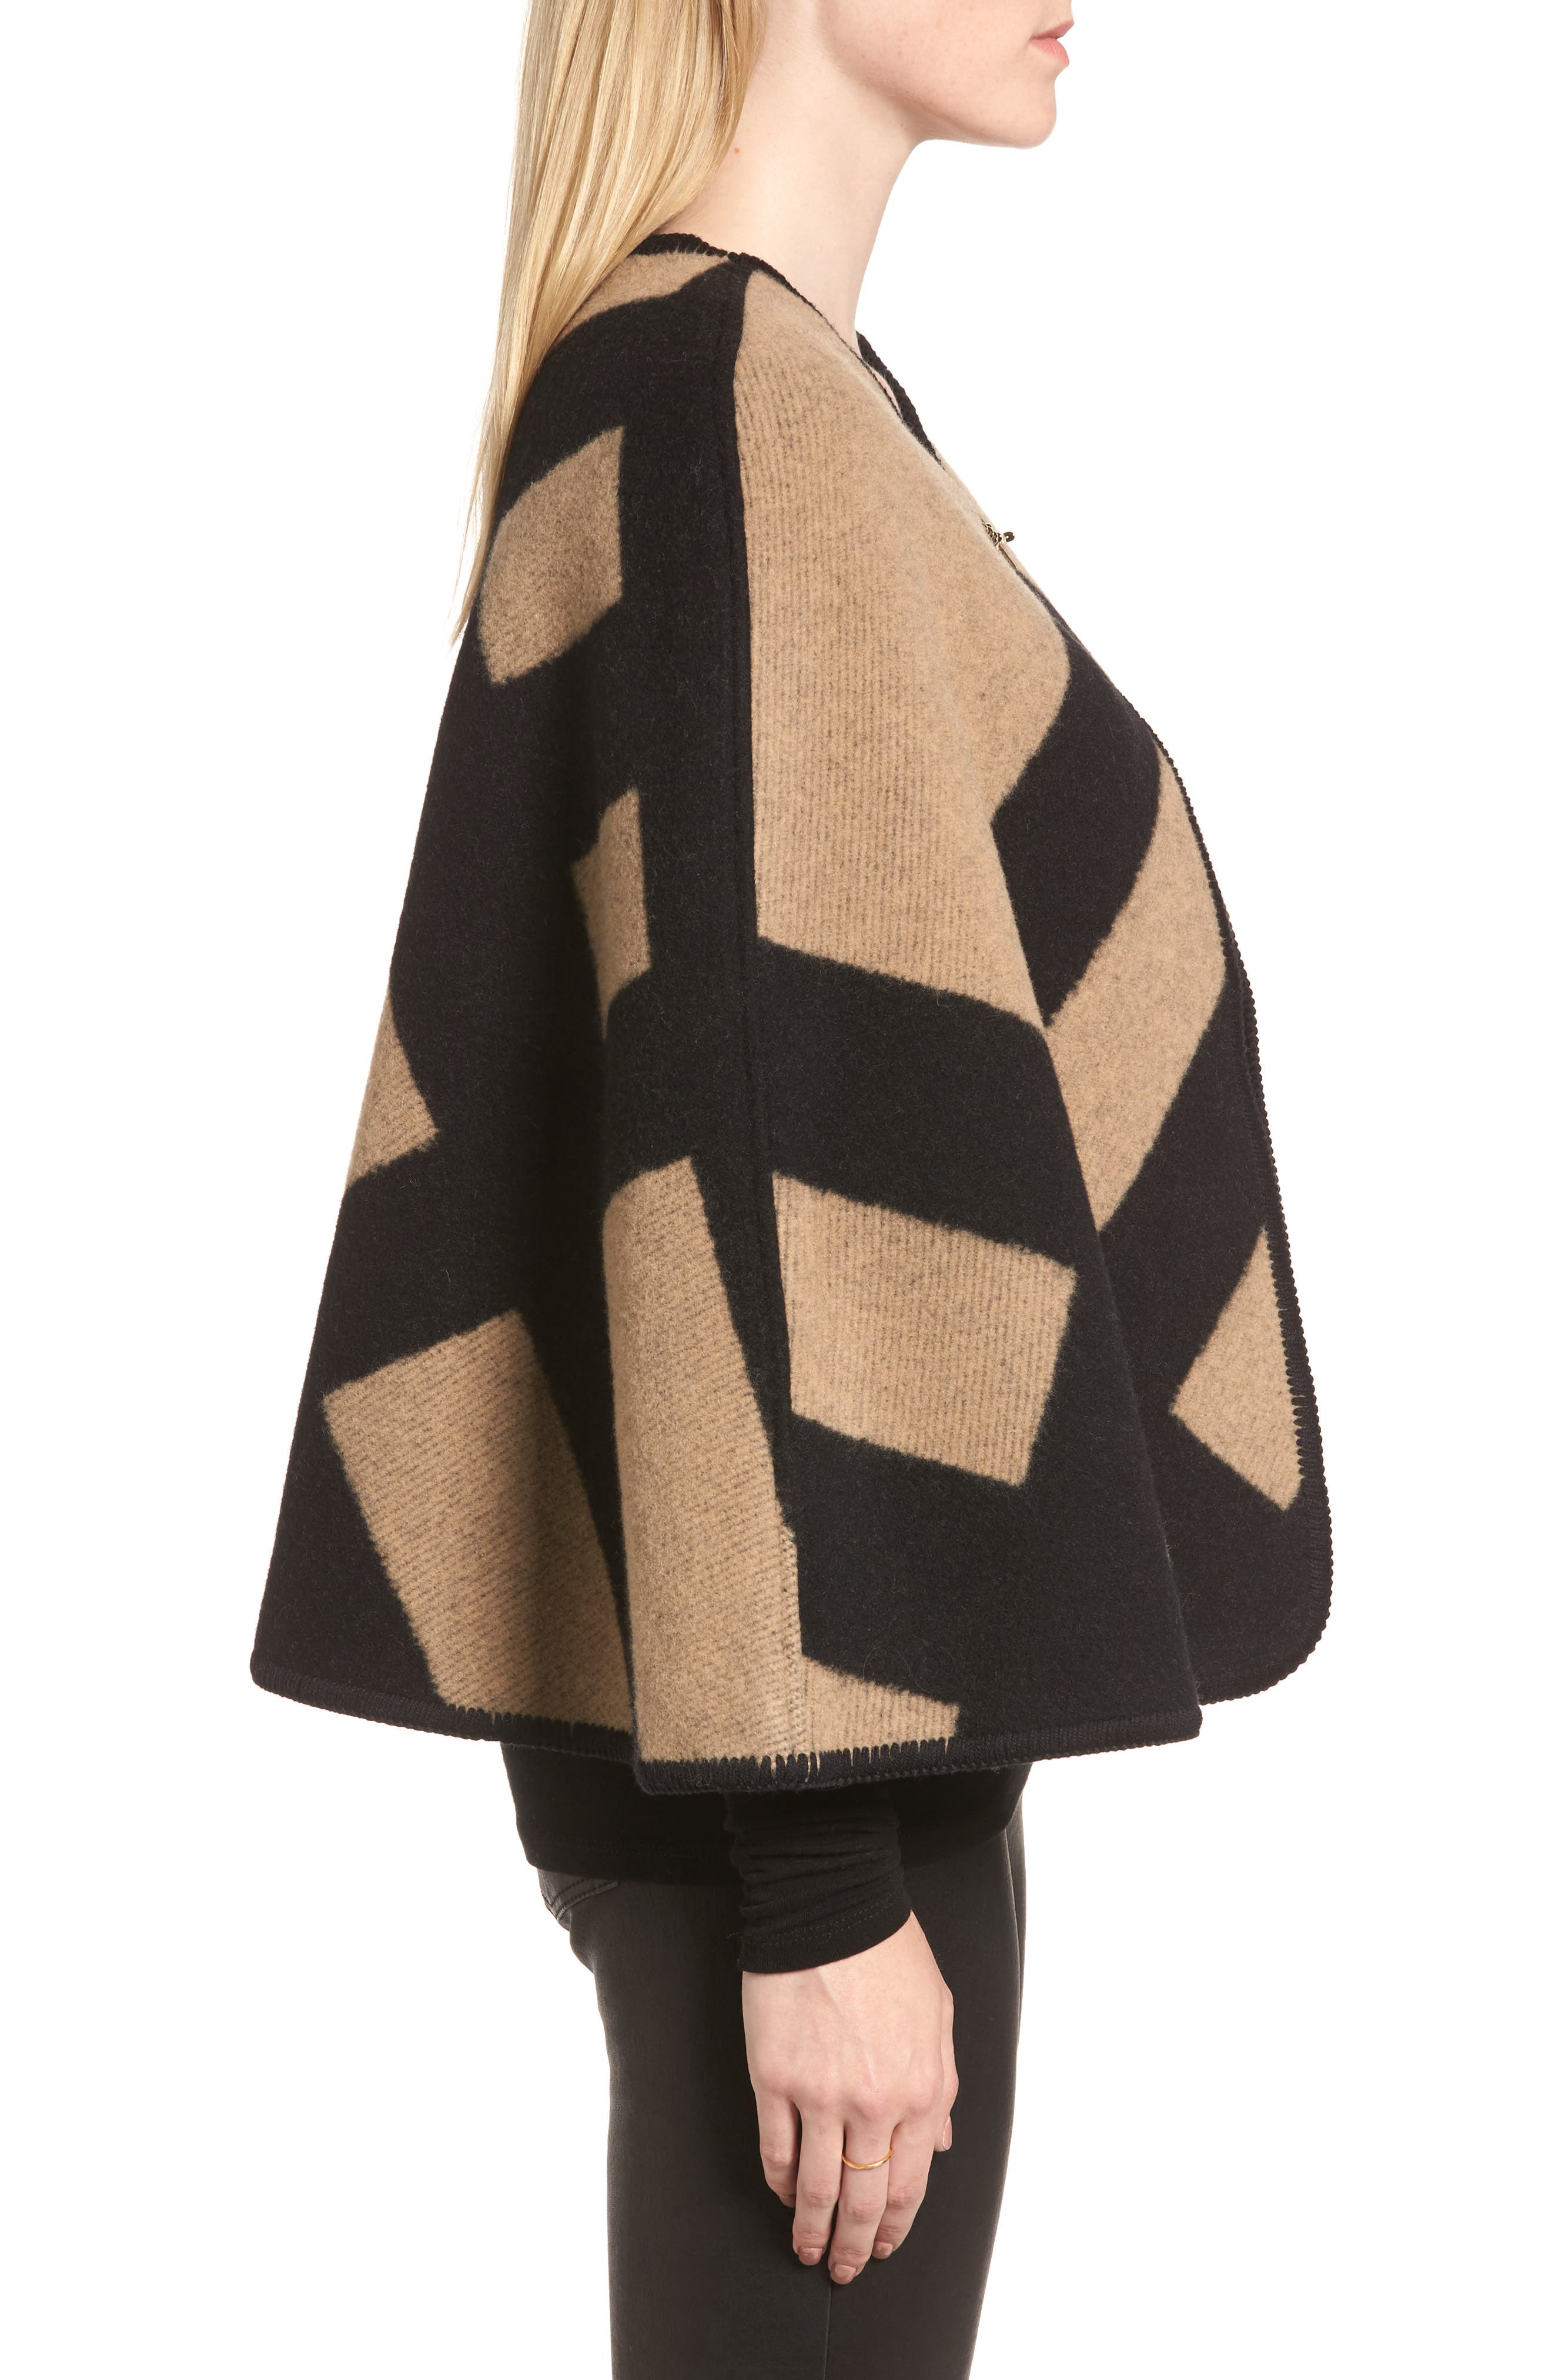 Blanket Check Wool & Cashmere Poncho,                             Alternate thumbnail 3, color,                             CAMEL/ BLACK